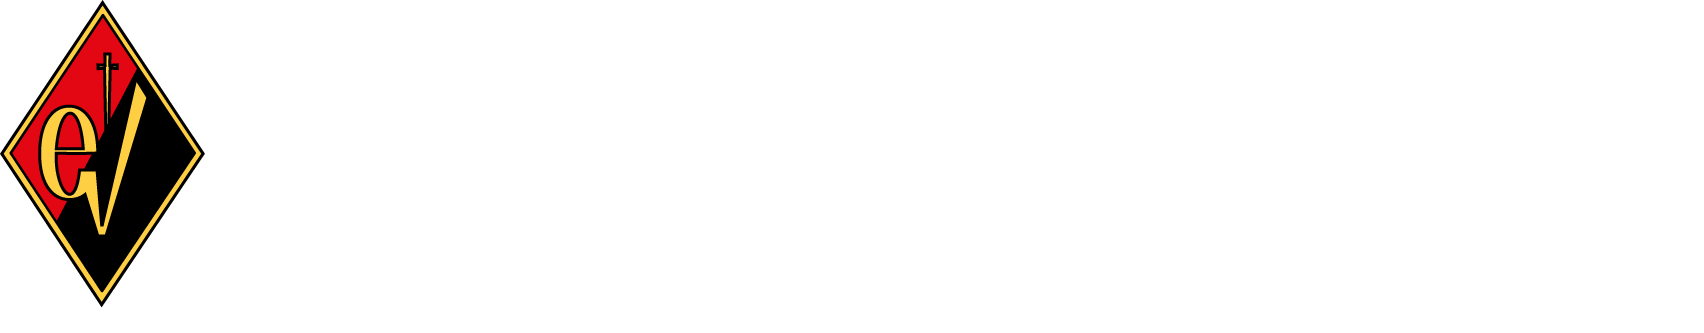 Fundación Colegio Emilio Valenzuela